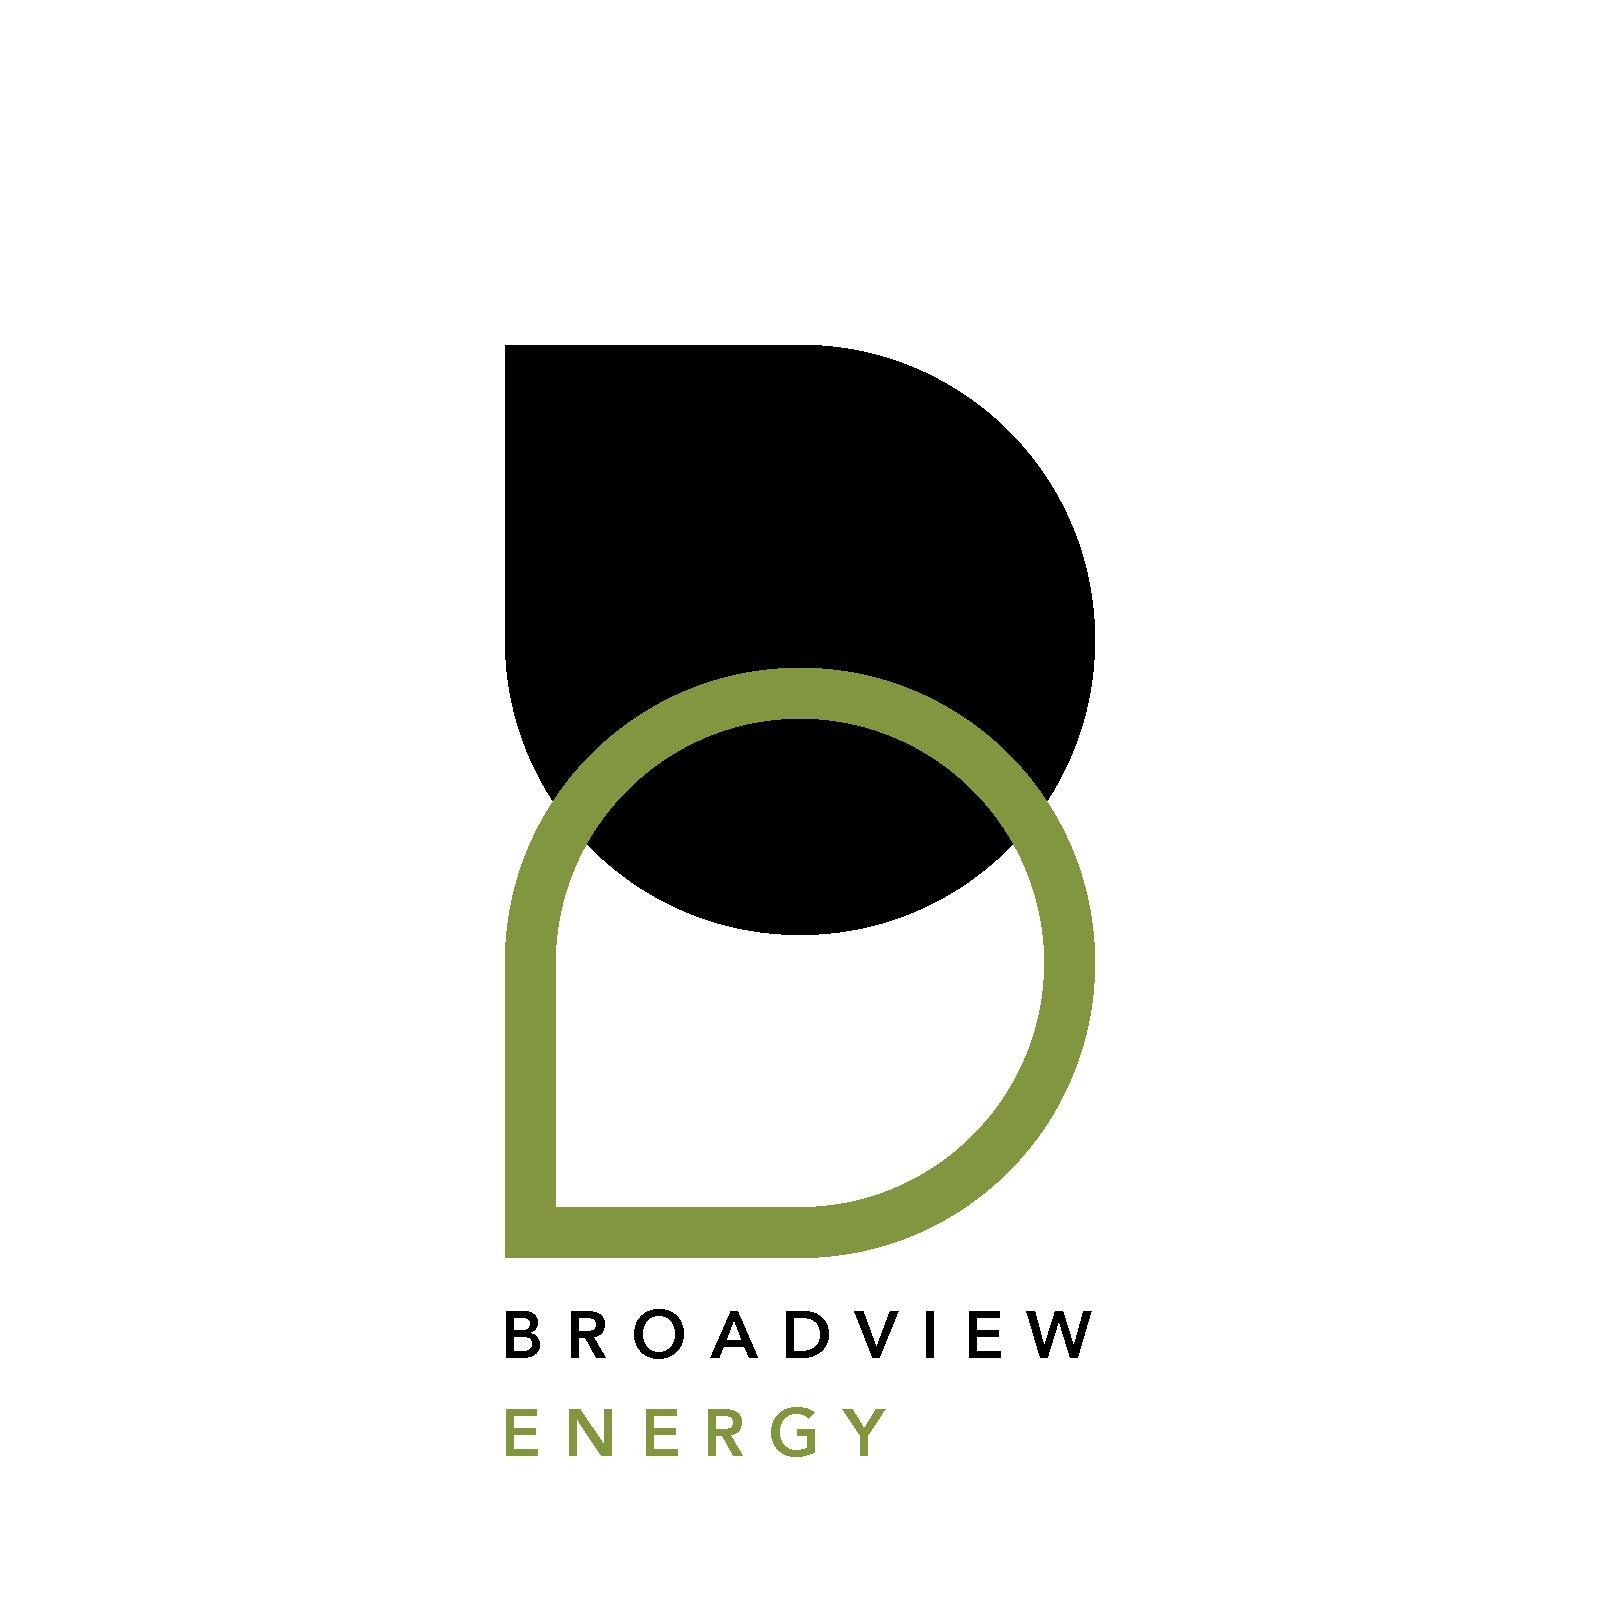 broadview-energy-logo_green__1600x1600.png